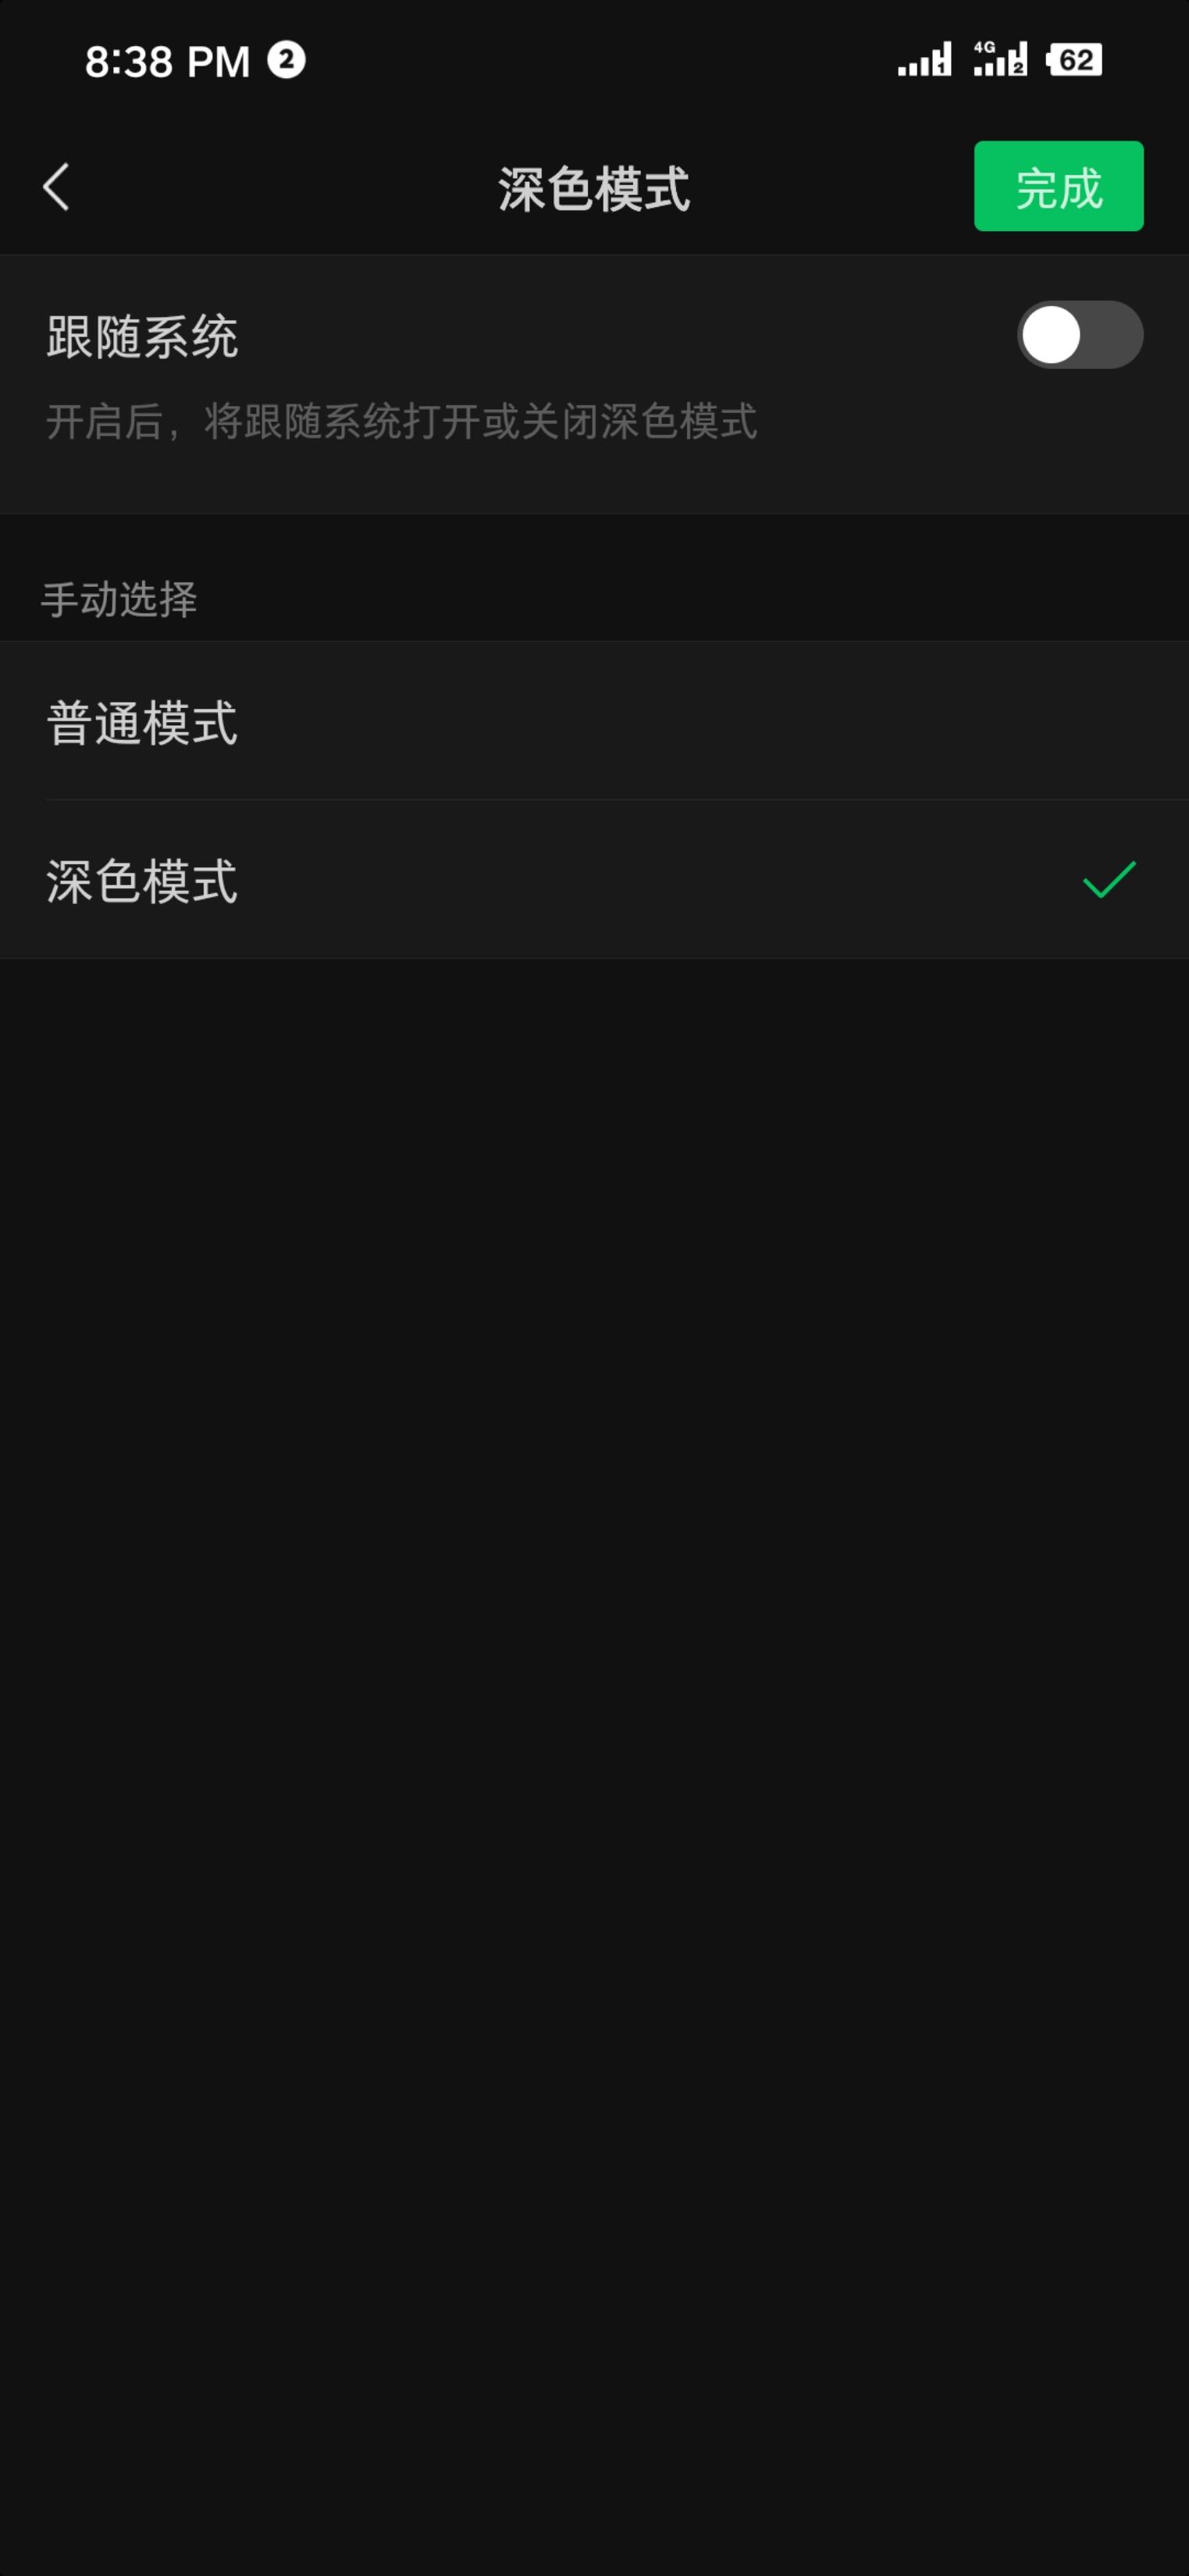 Screenshot_2021-05-20-20-38-55-391_??.png